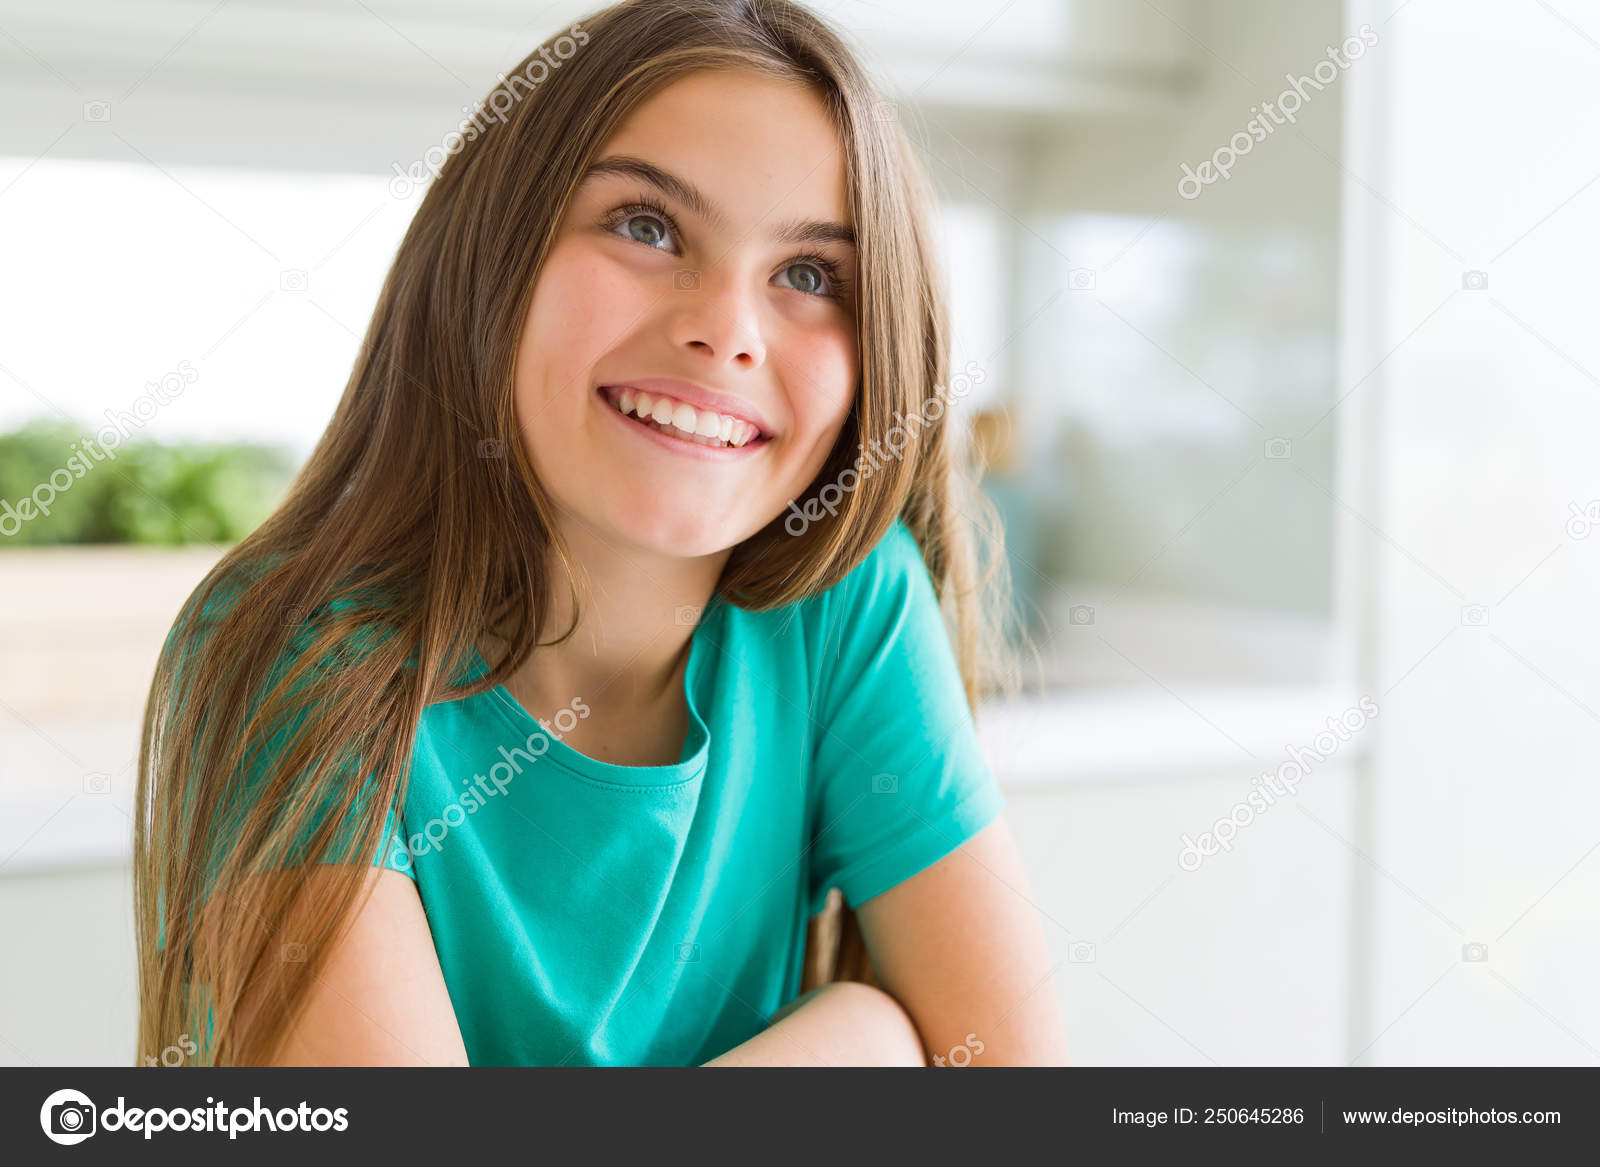 Meet pretty girl